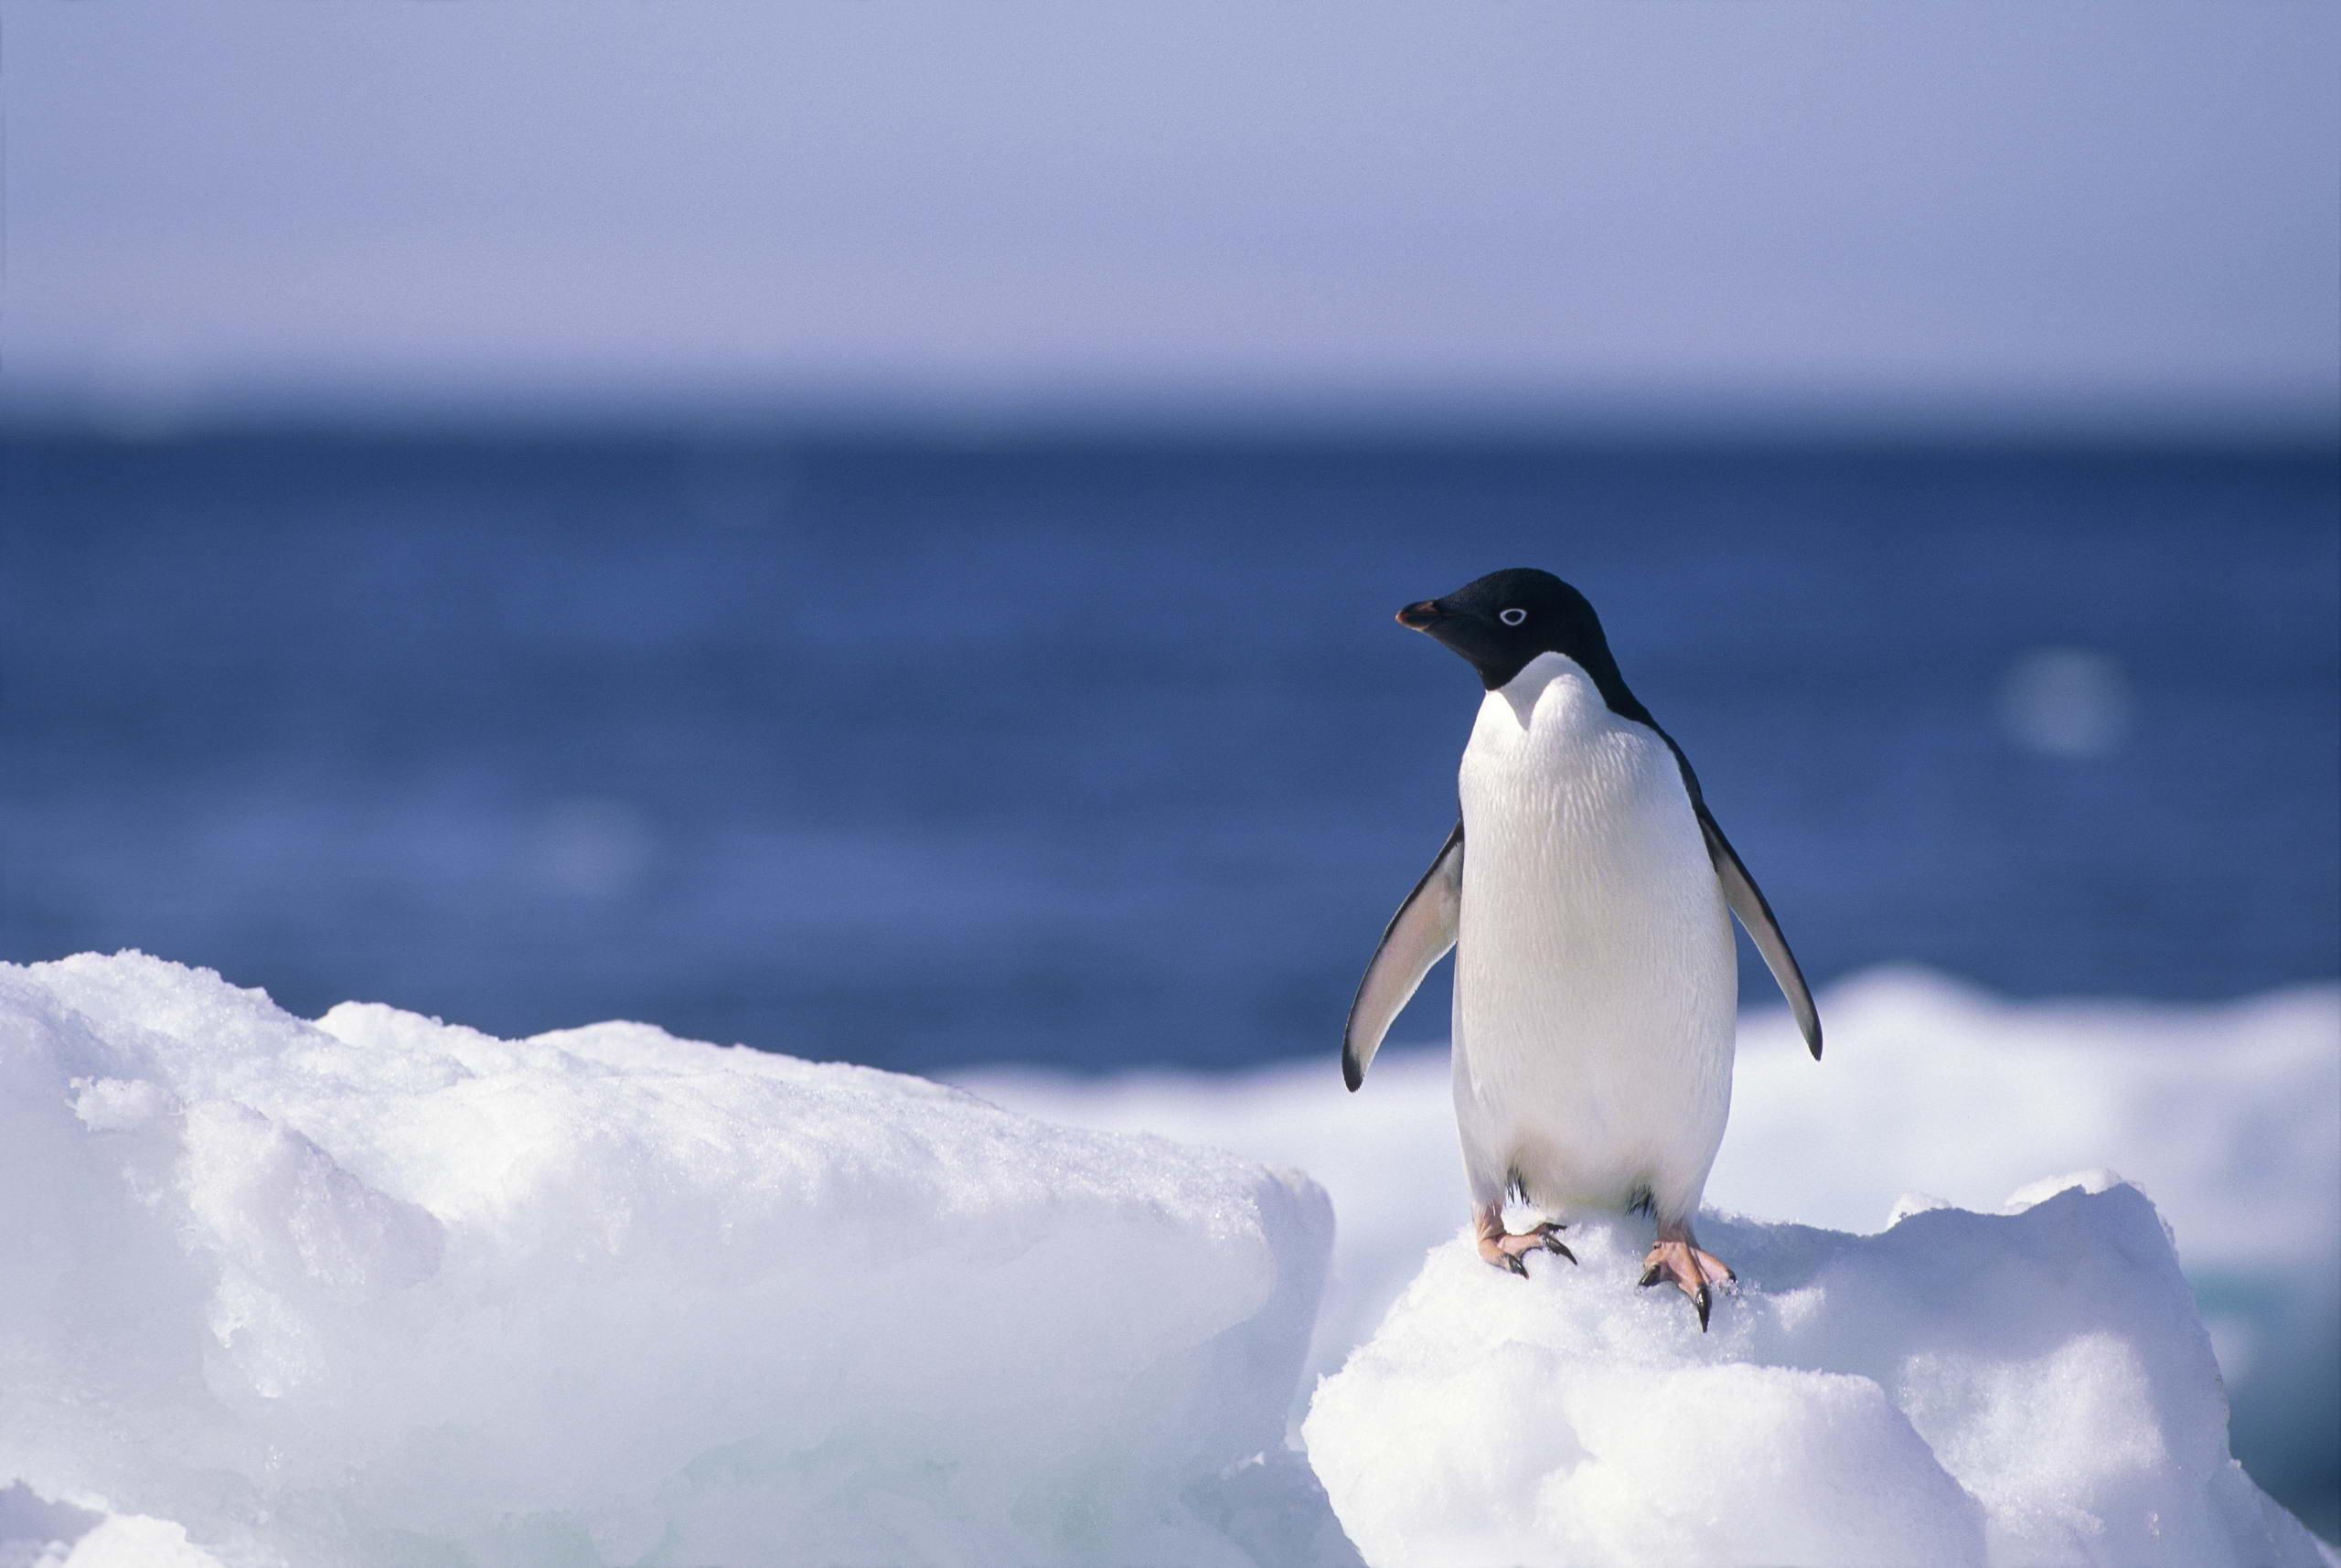 Penguin Backgrounds